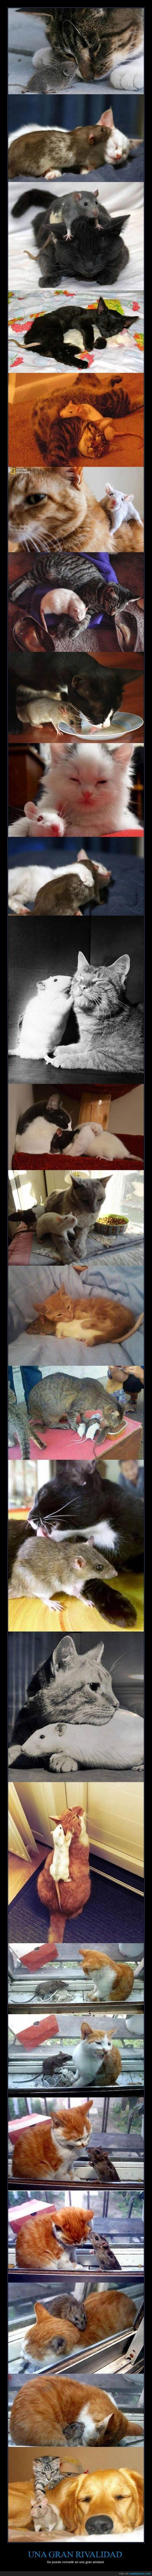 animales,gatitos,mascota,perro,ratas,raton,ratones